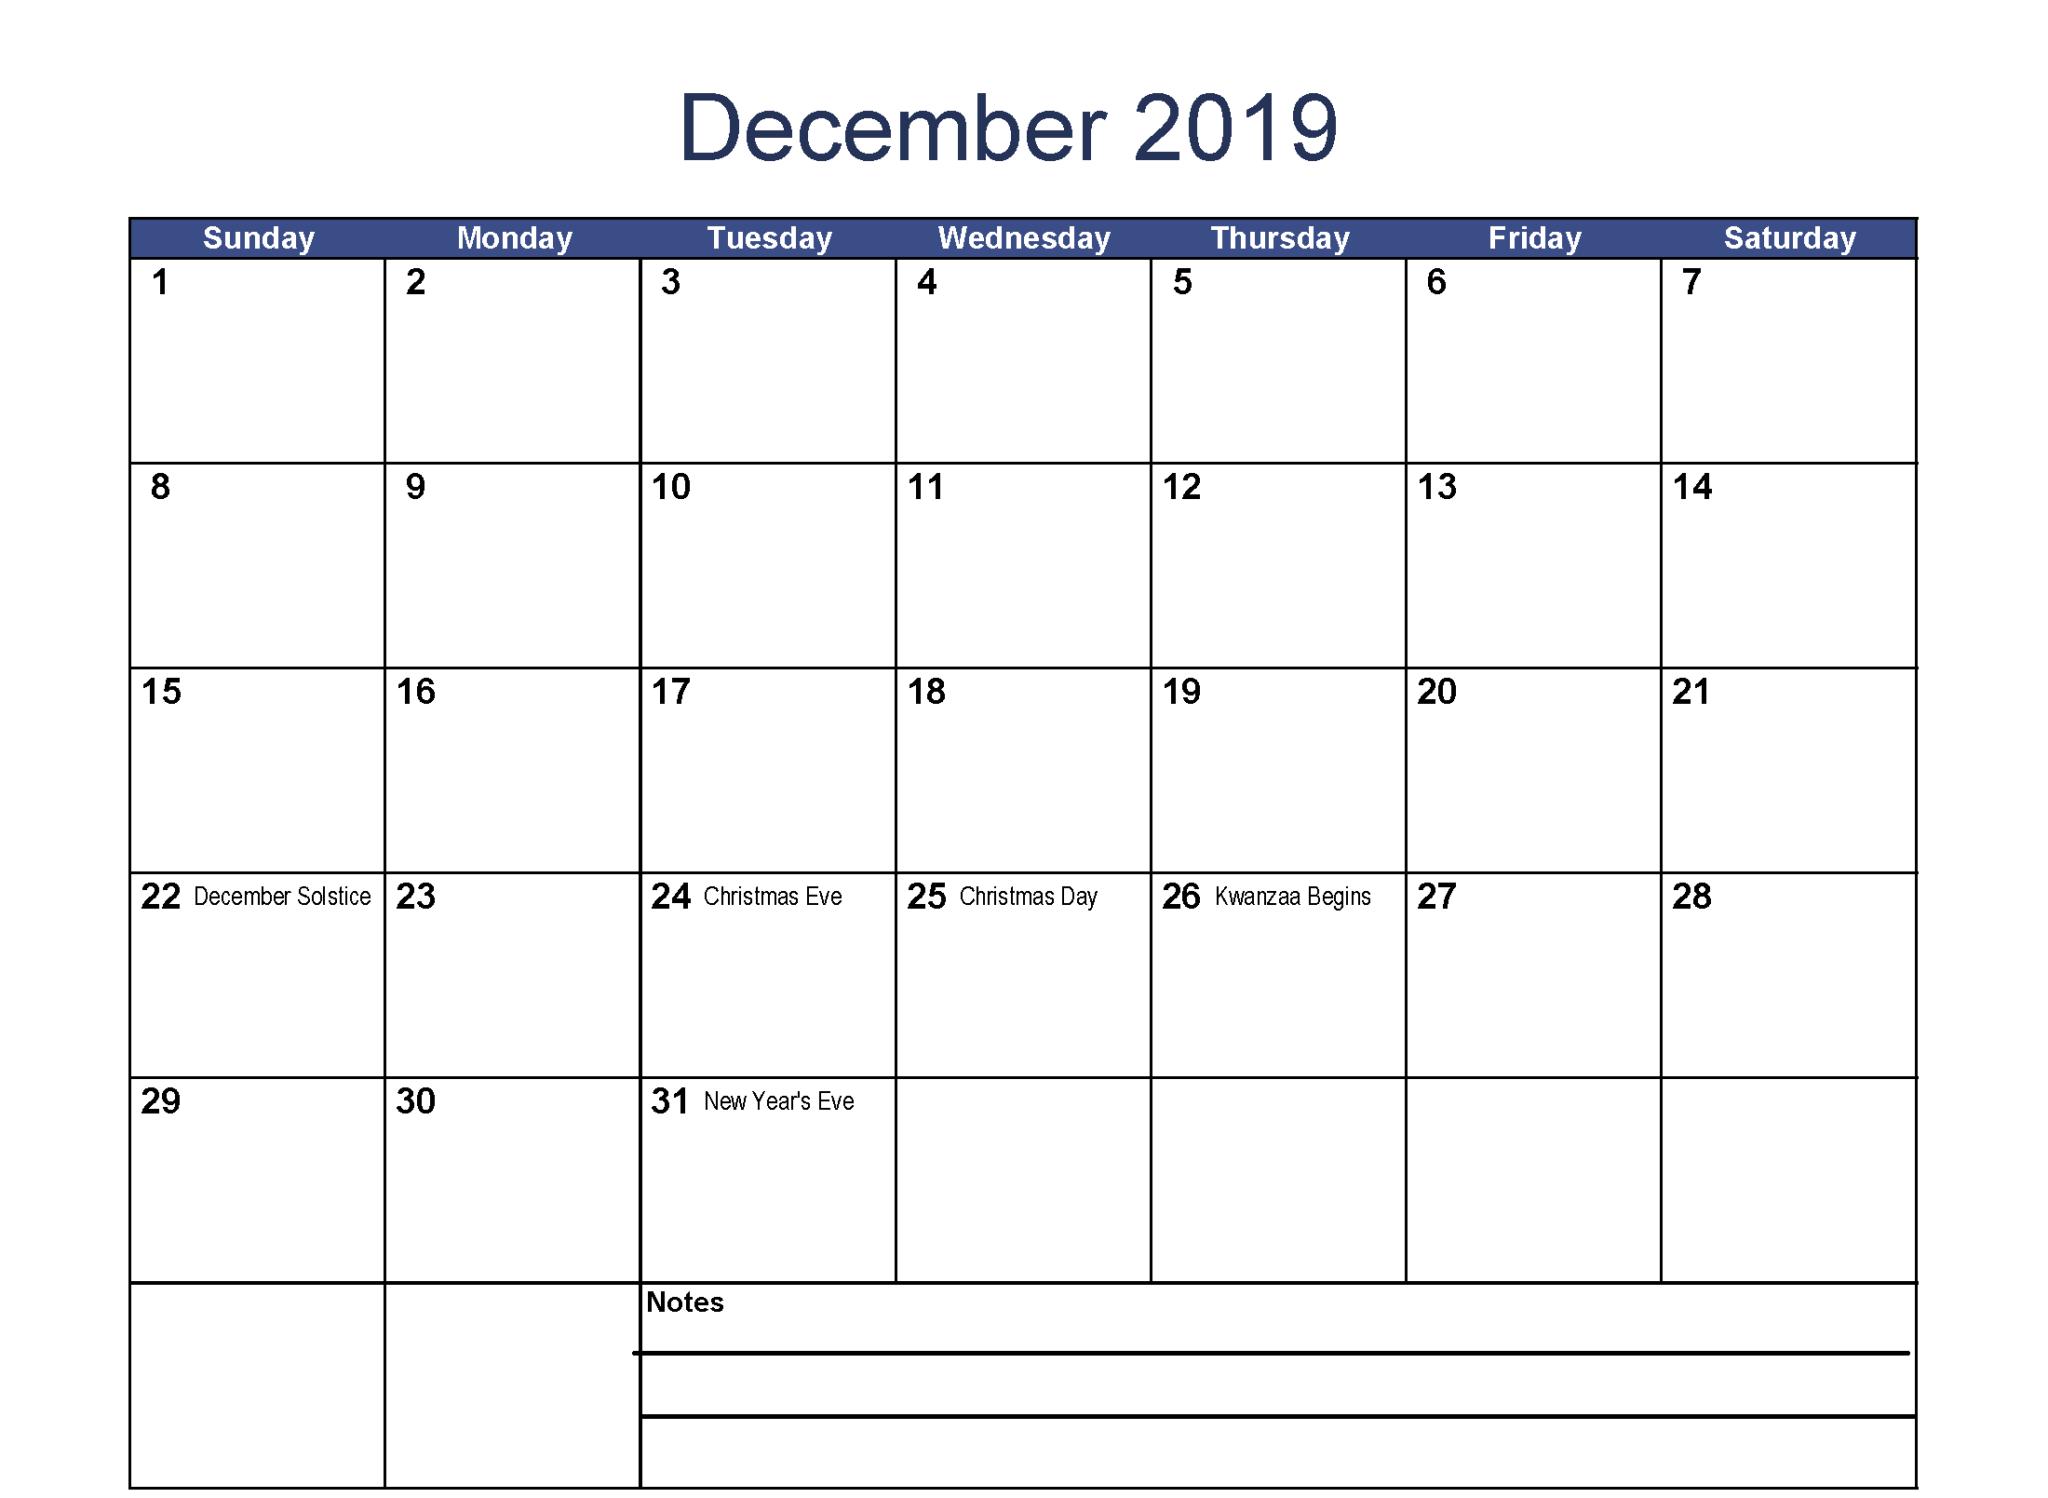 December 2019 Calendar With Holidays Word